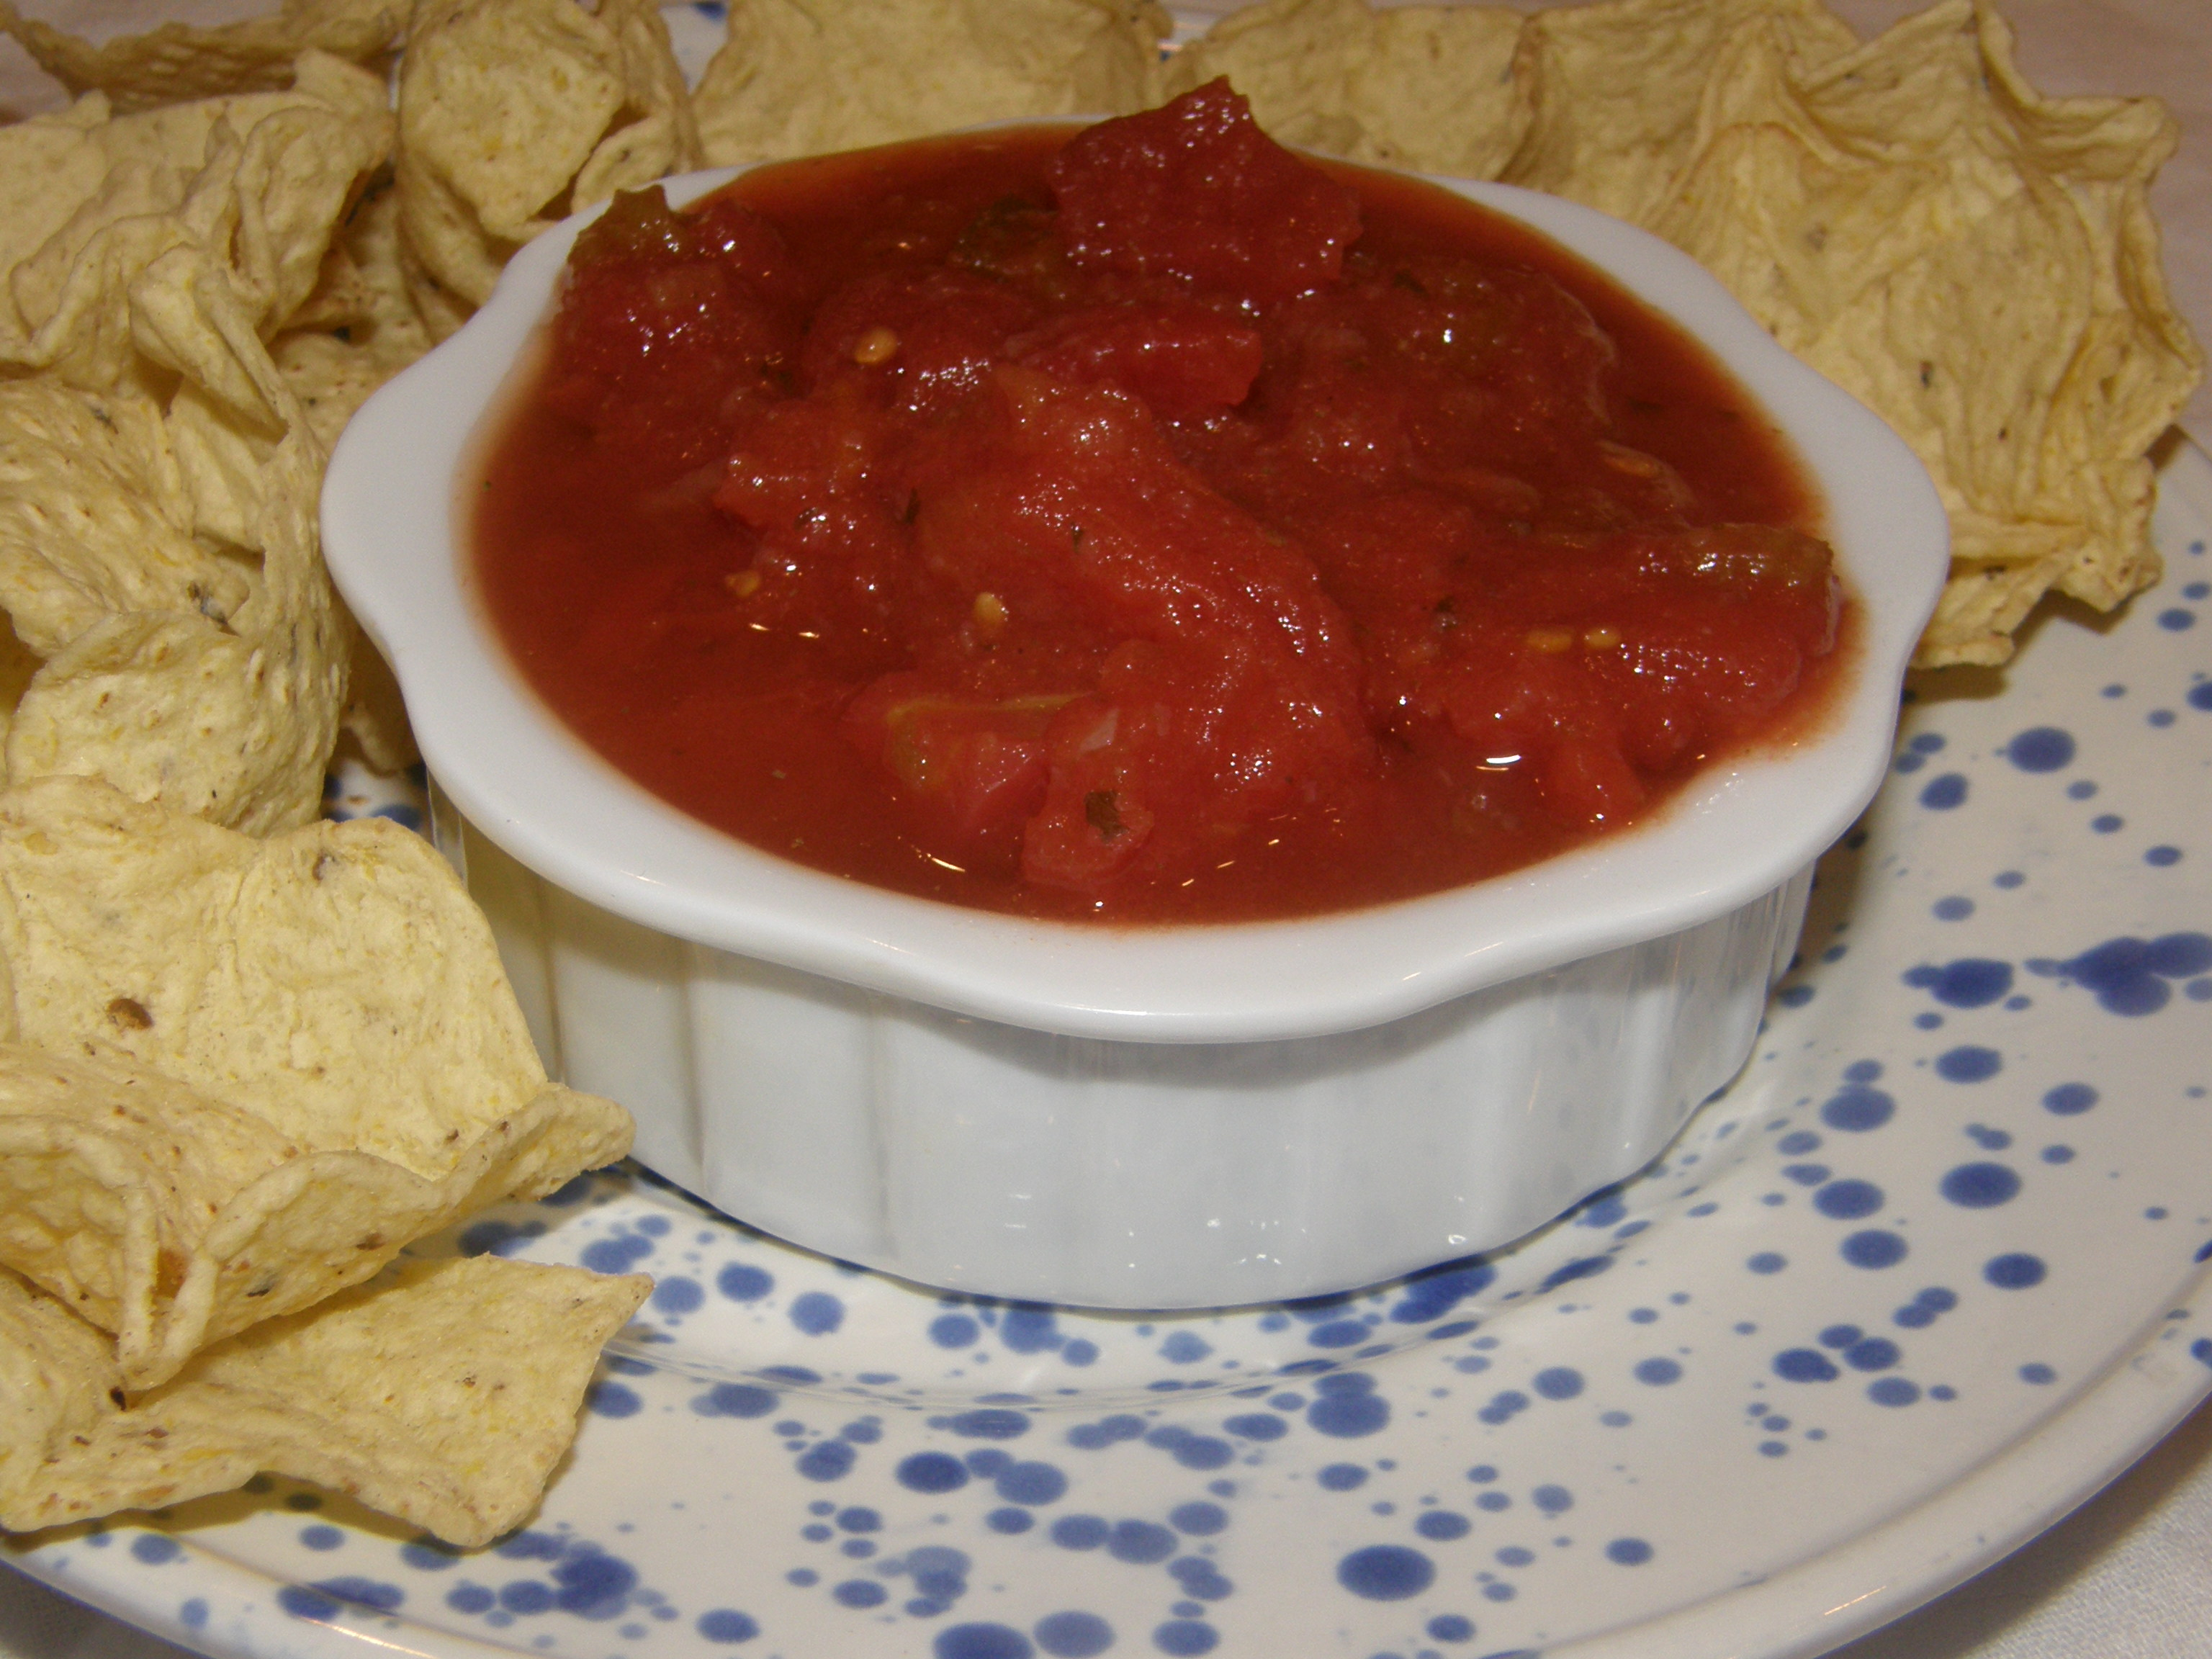 The Best Restaurant Salsa Made at Home